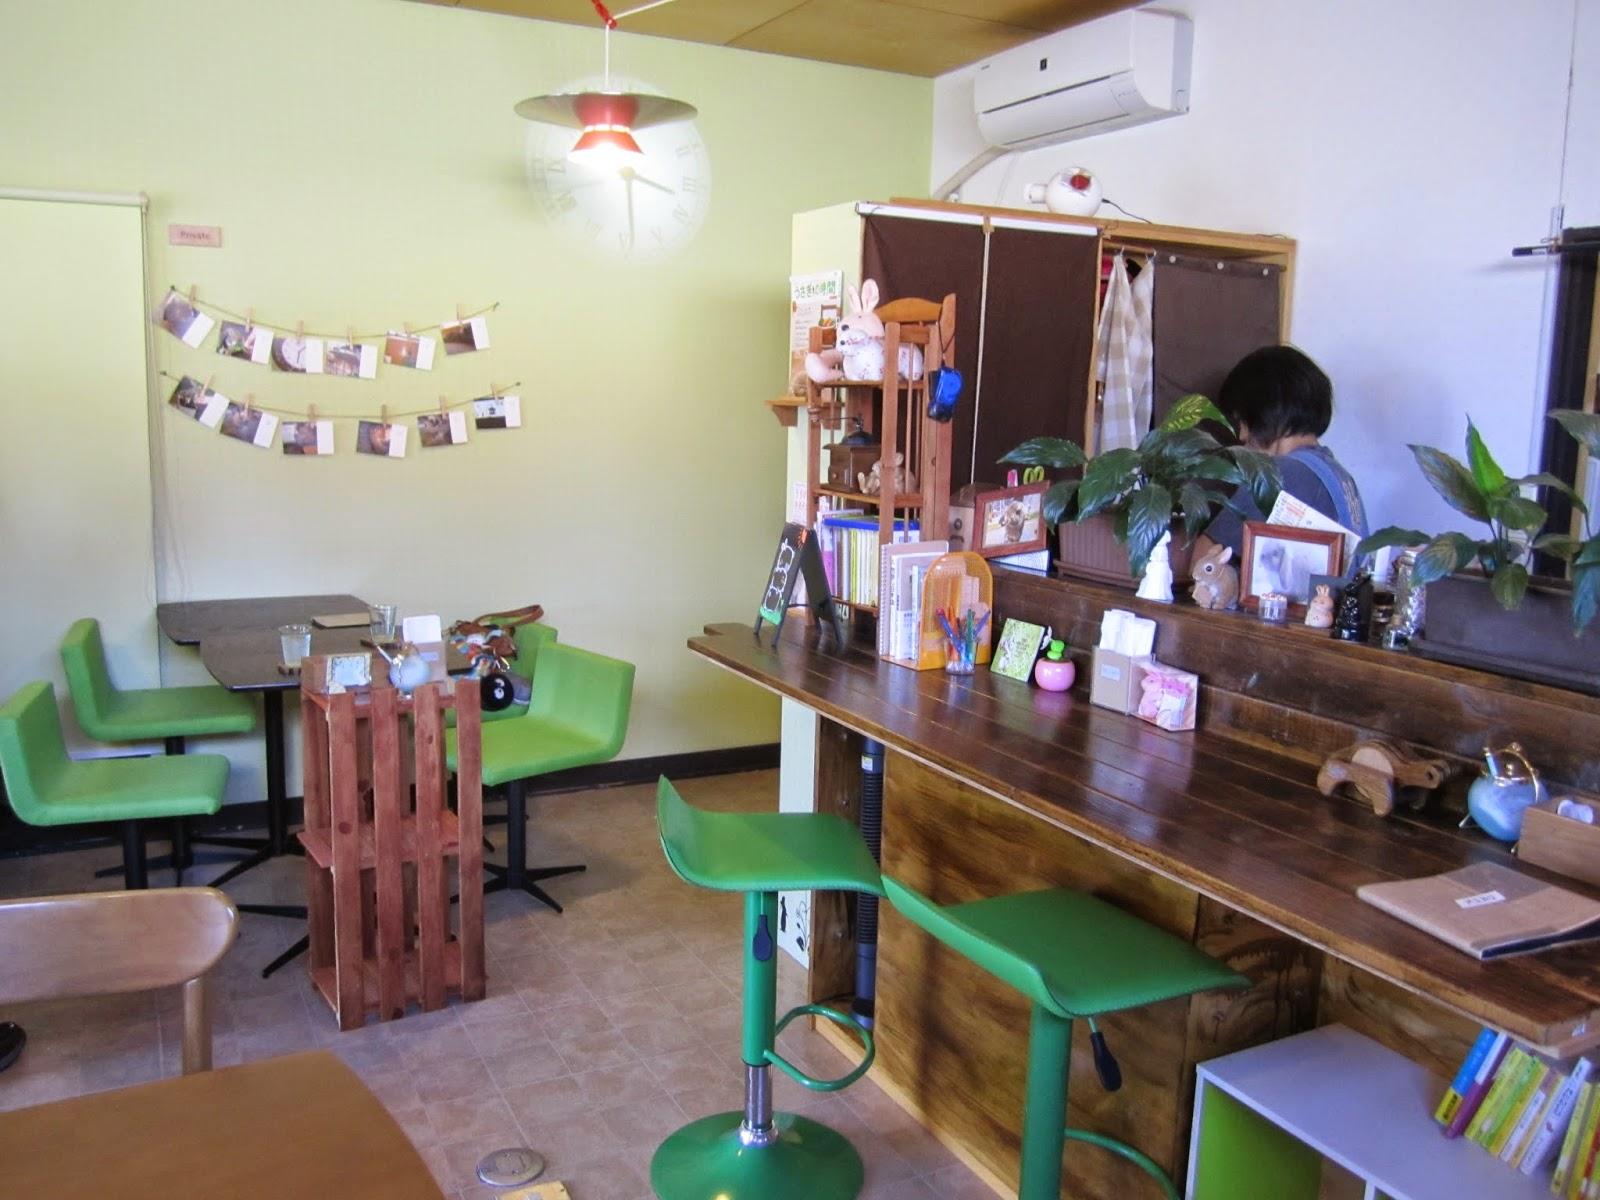 Towada Bunny Rabbit Cafe Usa Cafe Lovelies十和田市うさぎカフェ うさカフェラヴリーズ